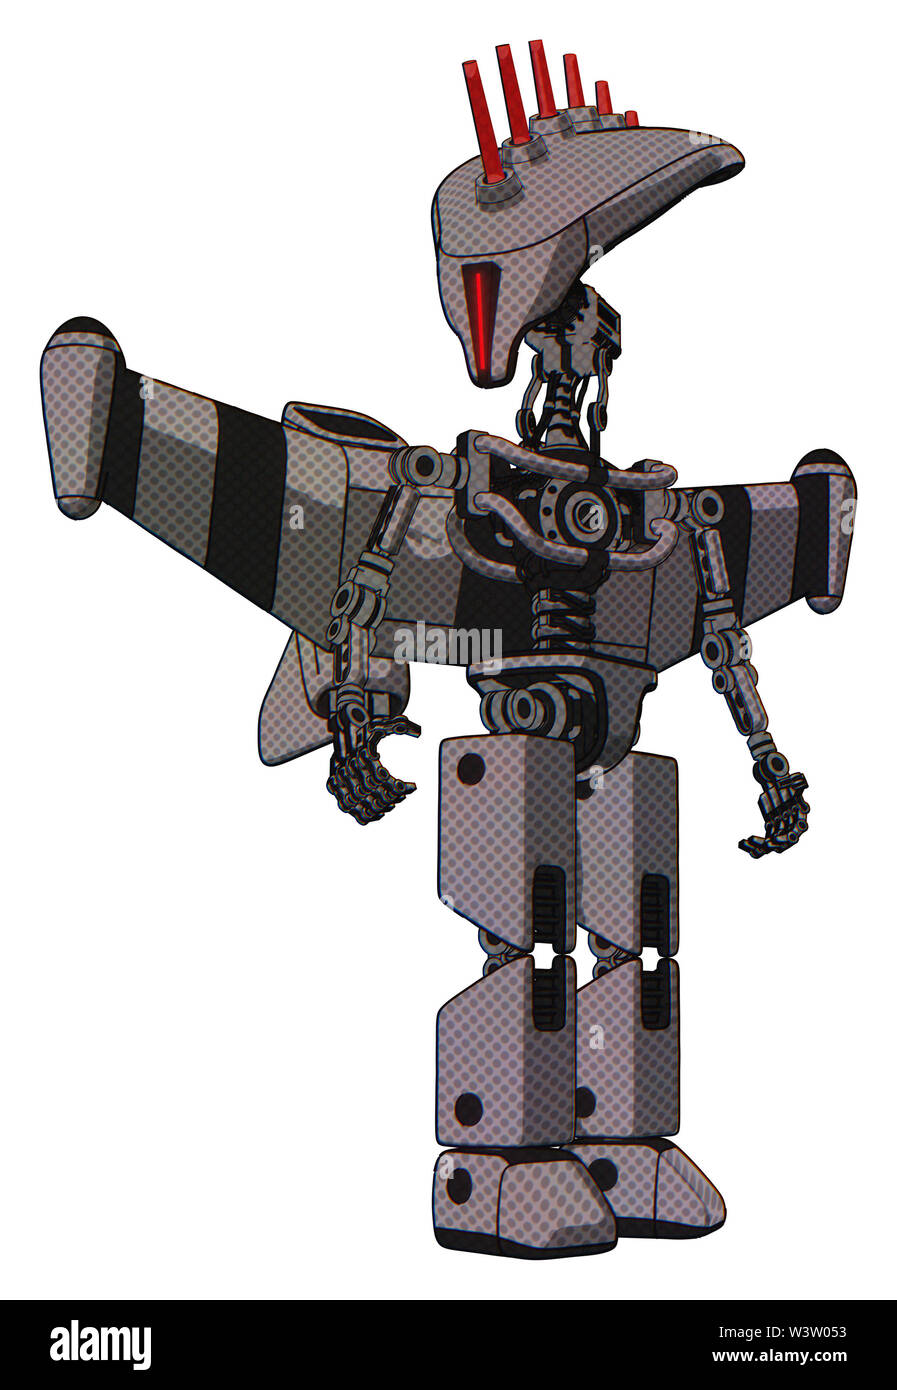 Bot containing elements: flat elongated skull head, light chest exoshielding, stellar jet wing rocket pack, no chest plating, prototype exoplate legs. - Stock Image